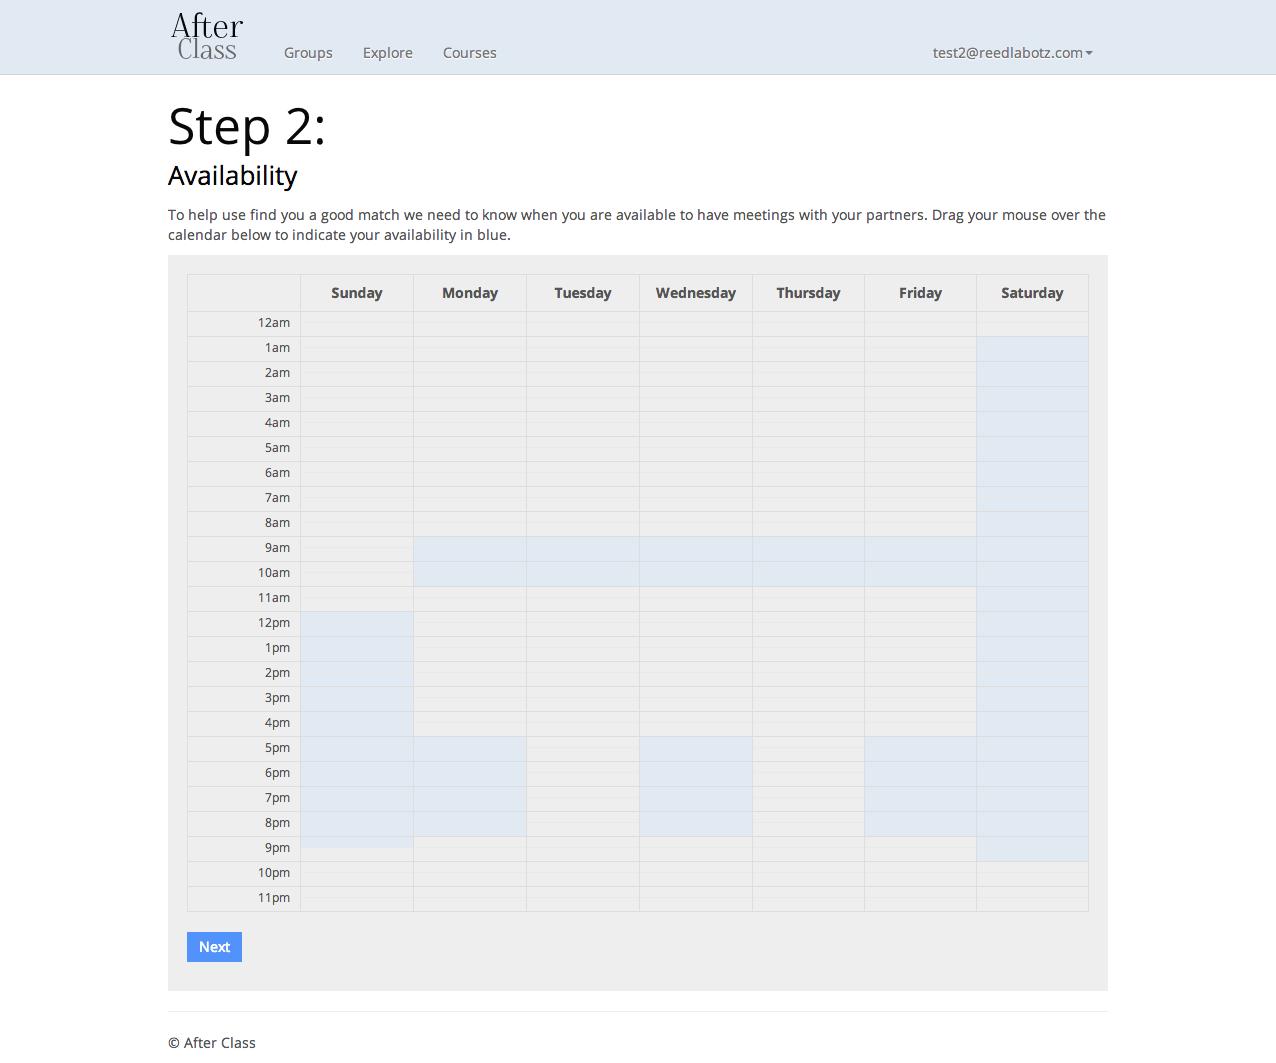 Availability screen